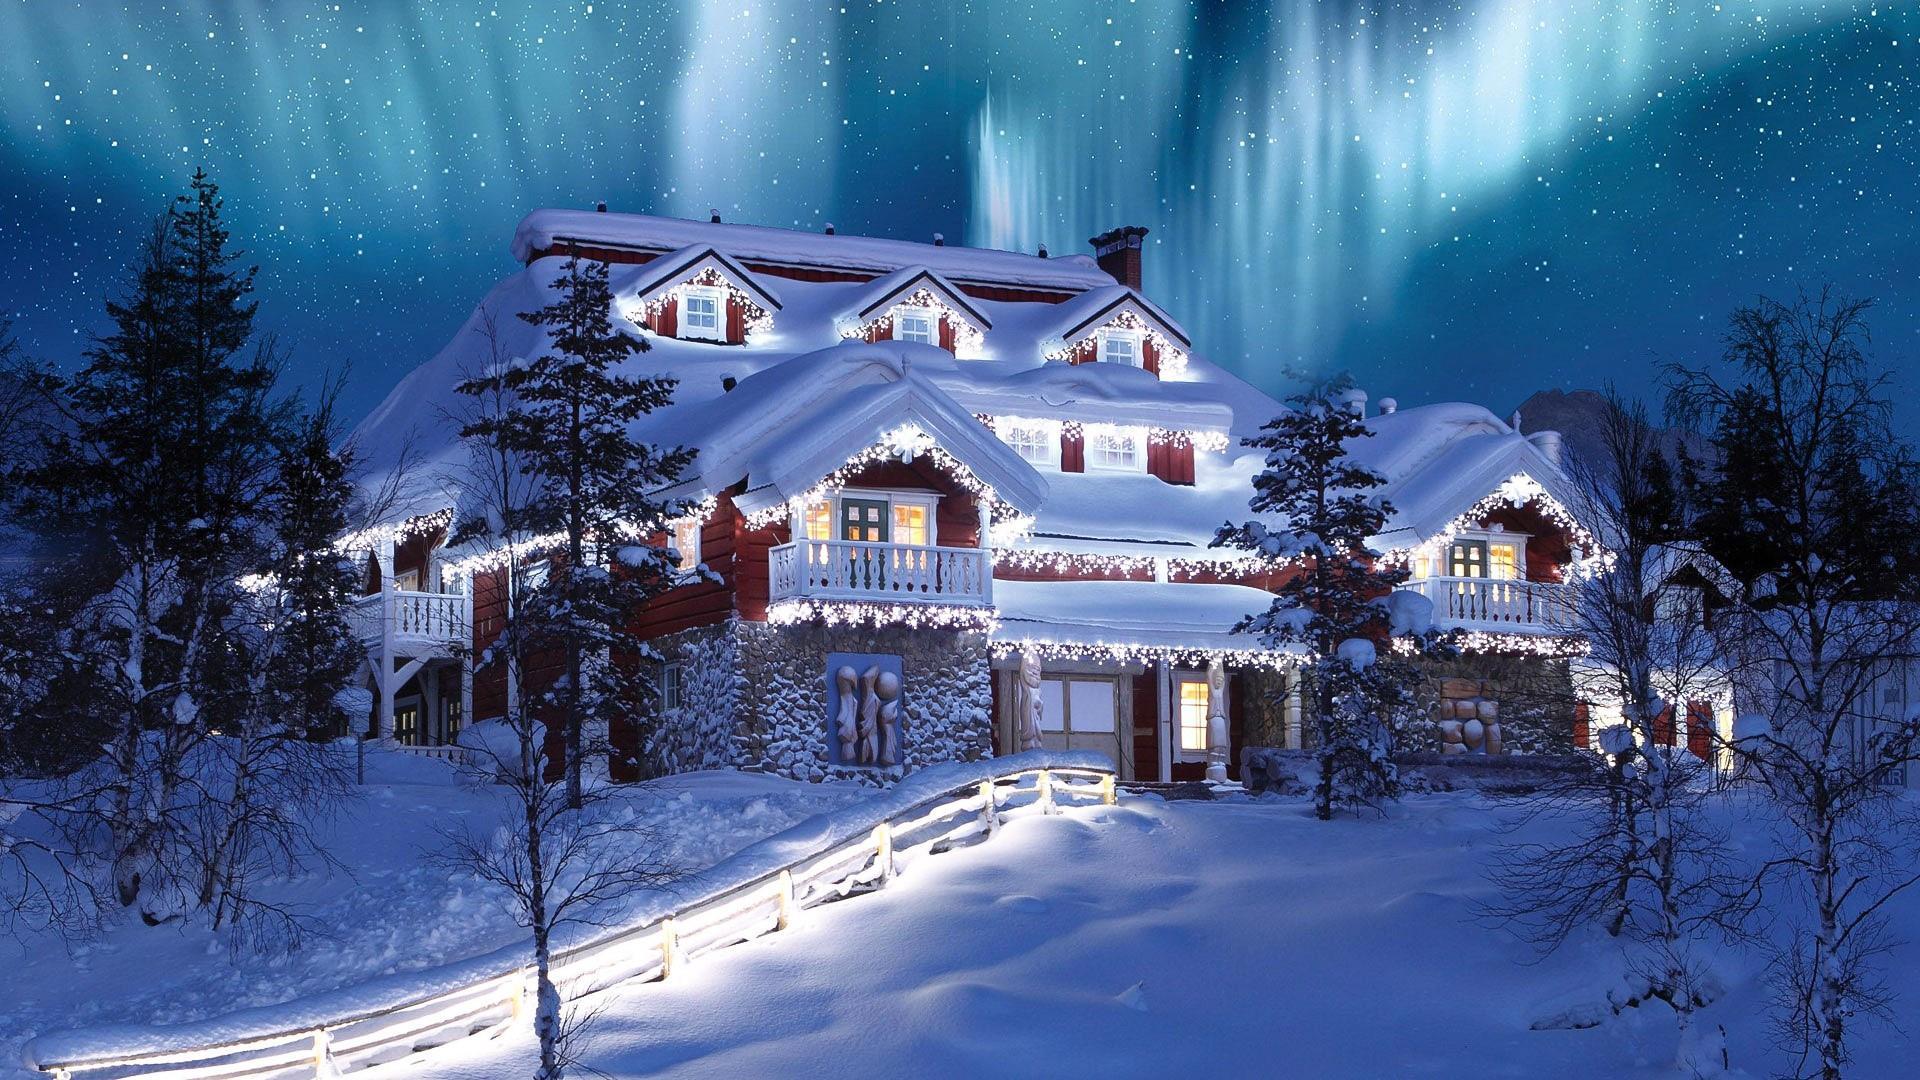 Christmas Northern Lights -Saariselkä, Finland wallpaper